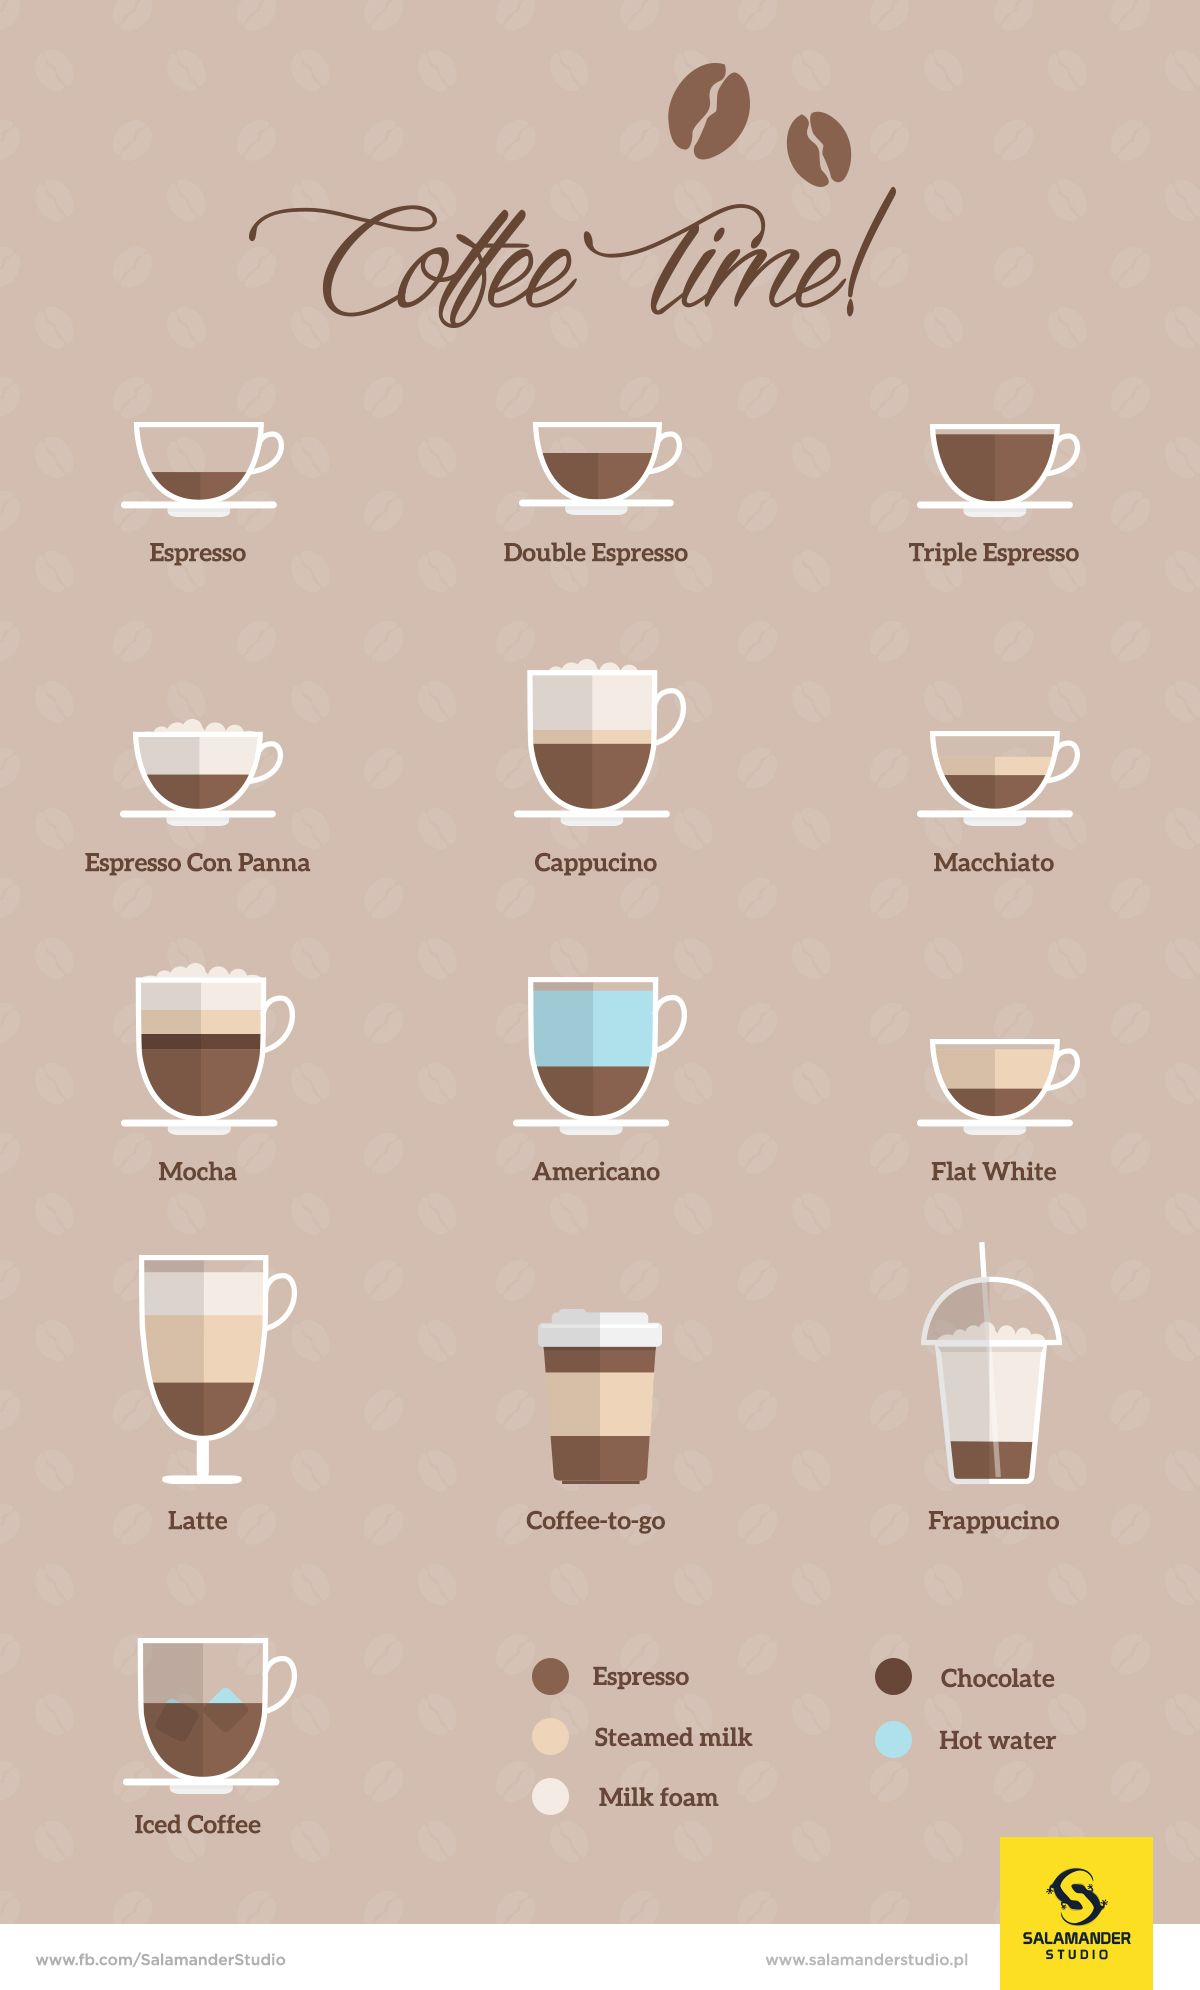 Flat infographic with coffee types: Espresso, Double Espresso, Triple Espresso, Espresso Con Panna, Cappucino, Macchiato, Mocha, Americano, Flat White